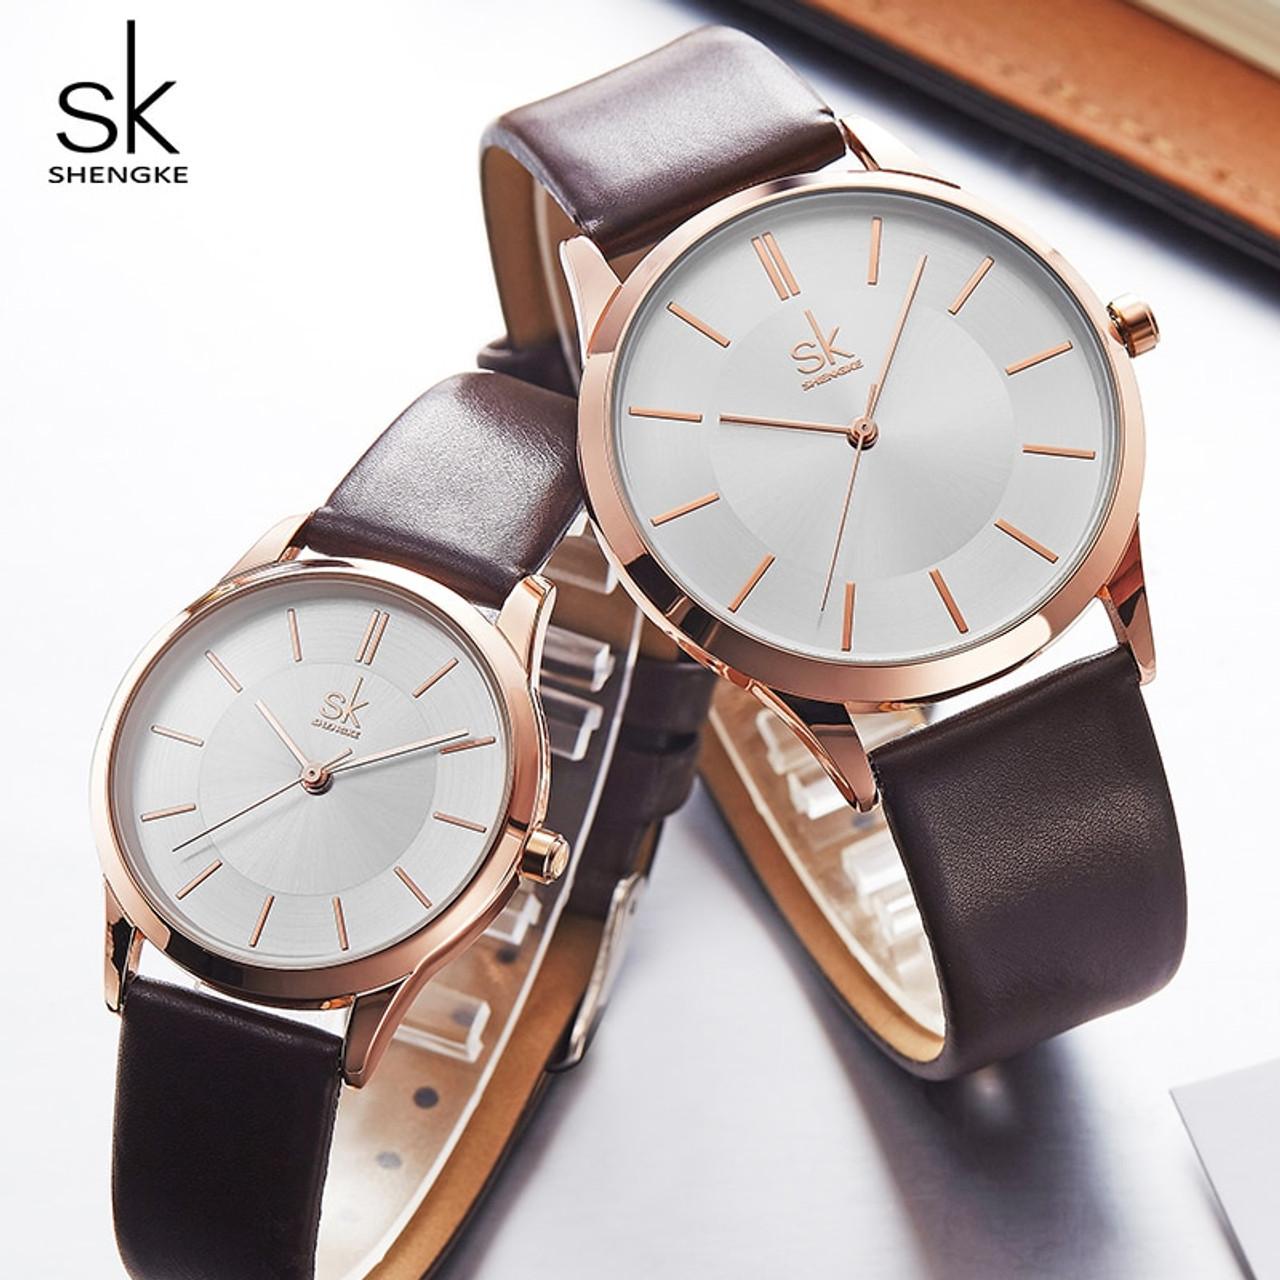 0640b734e521 Shengke New Fashion Leather Strap Women Men Couple Watches Luxury Quartz  Female Male Wrist Watch 2018 ...